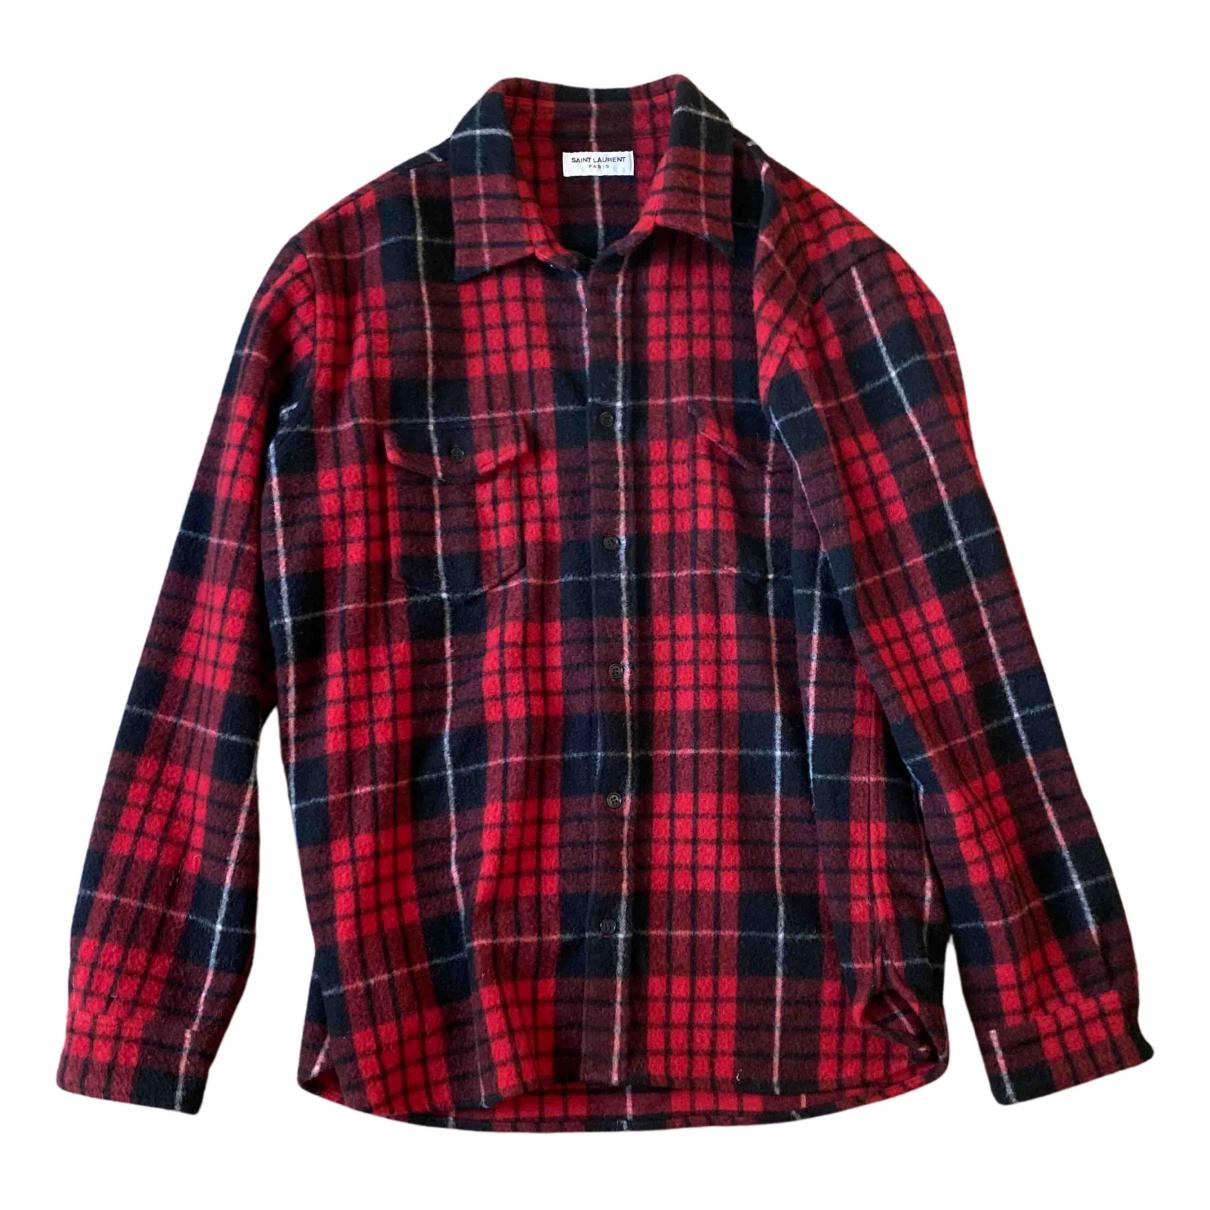 Yves Saint Laurent N Red Wool Shirts for Men L International